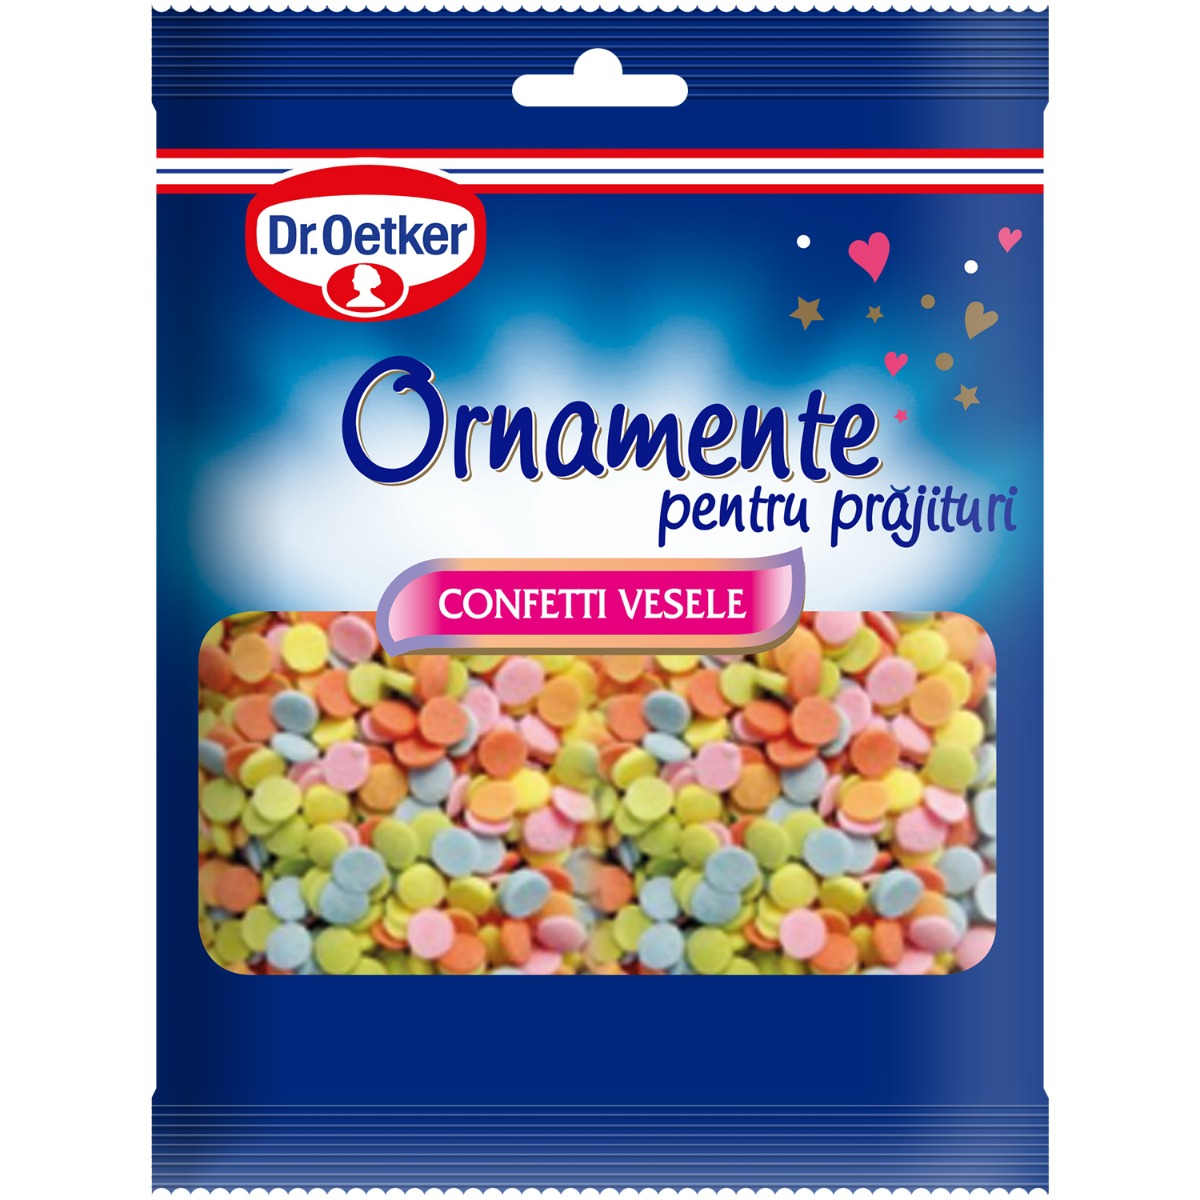 Ornamente pentru prajituri Dr Oetker, Confetti vesele, 30 g imagine